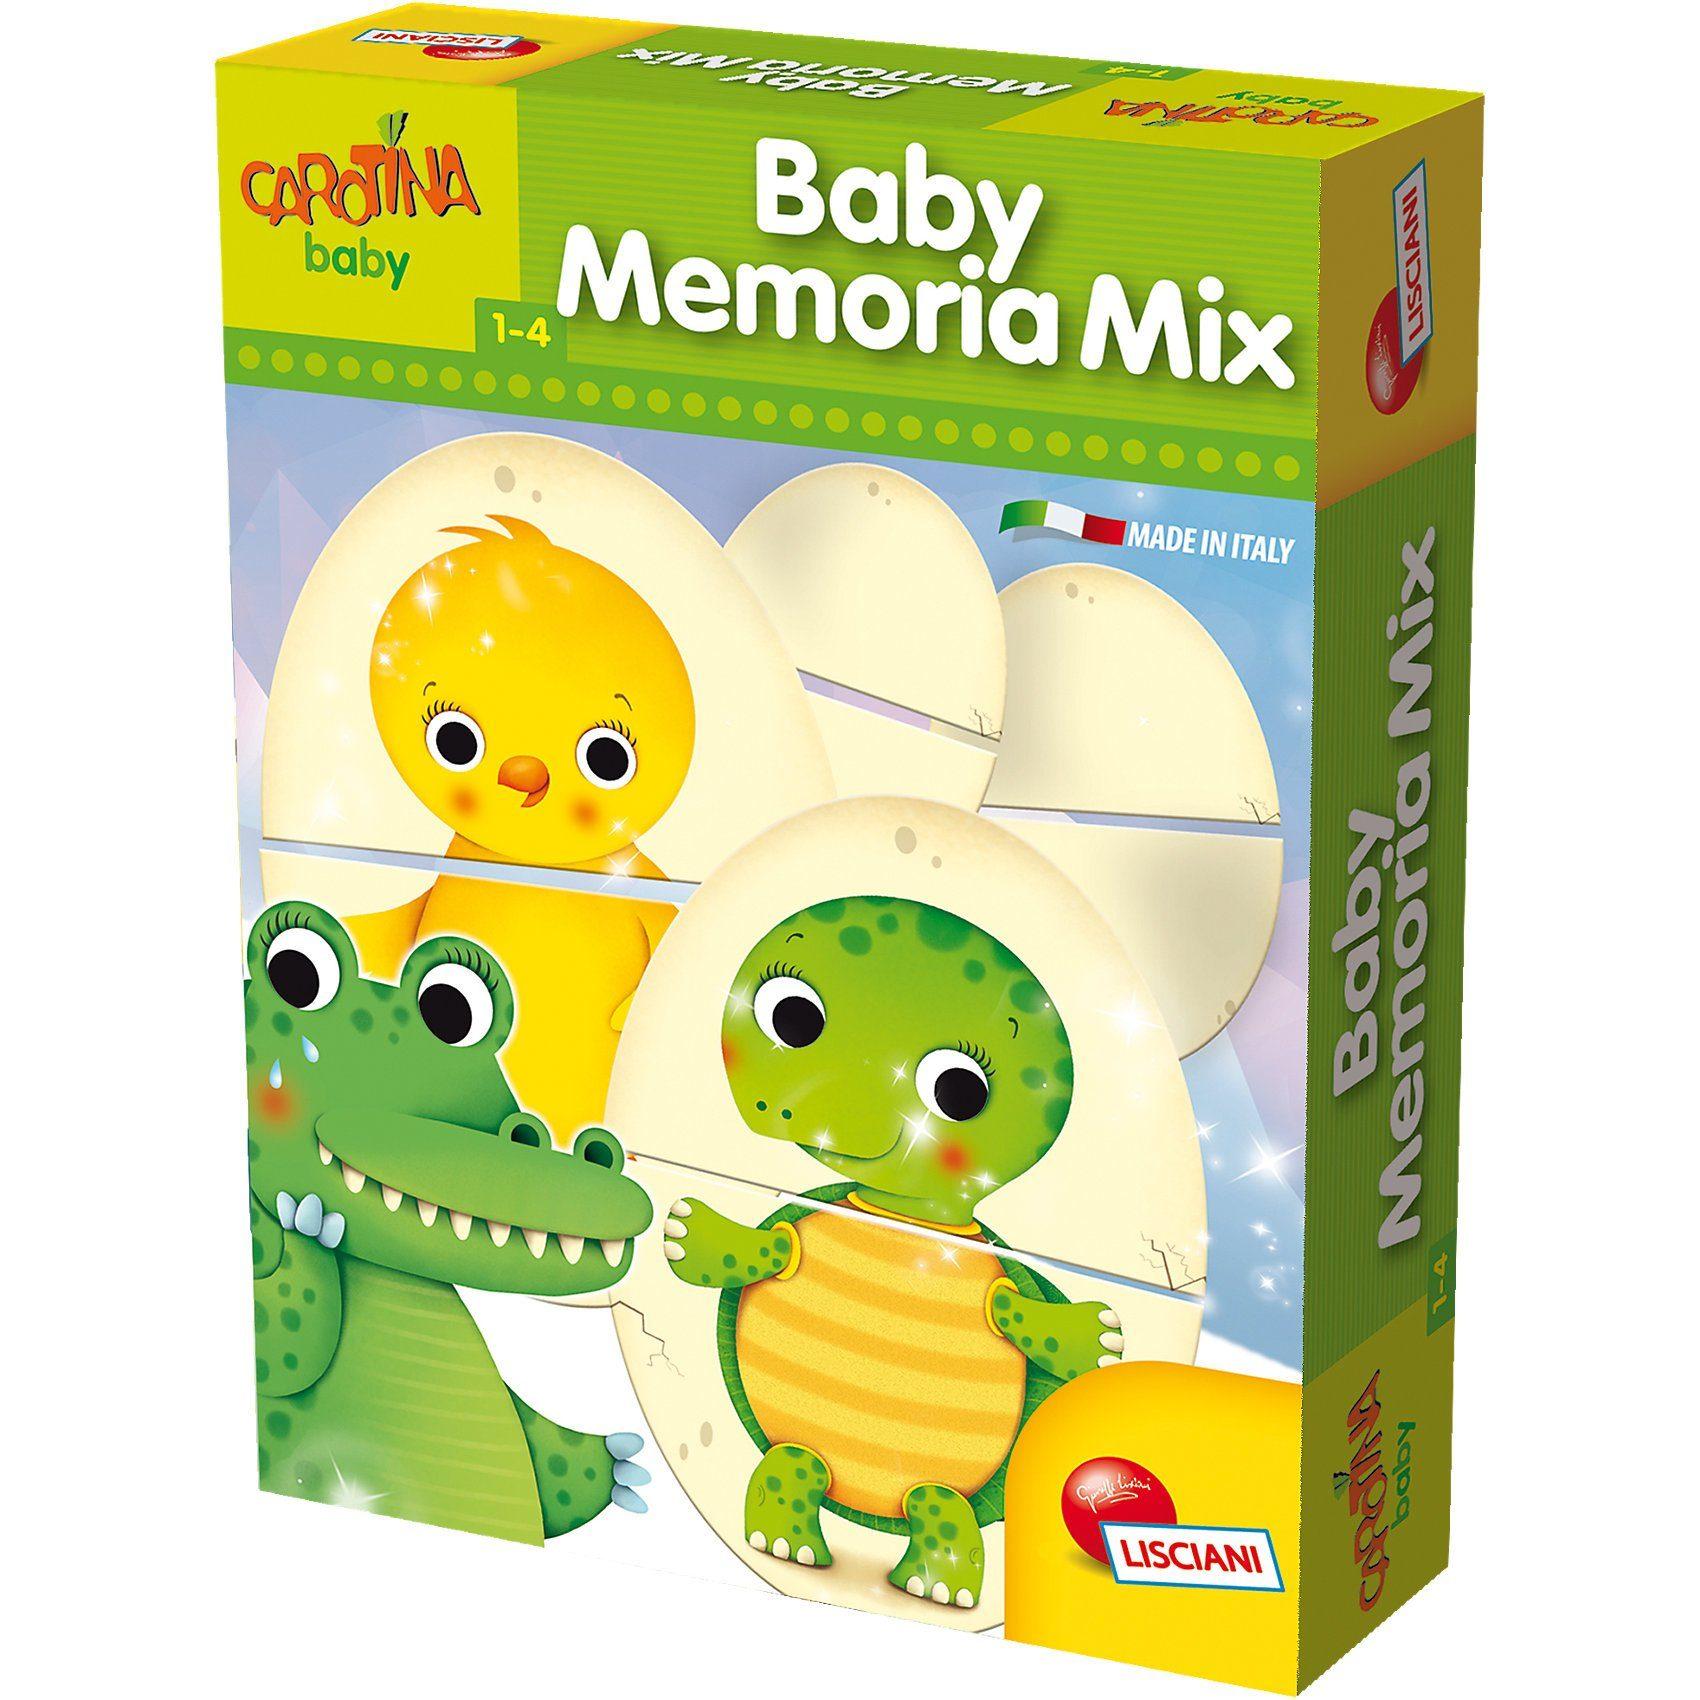 Lisciani Baby Memo Mix